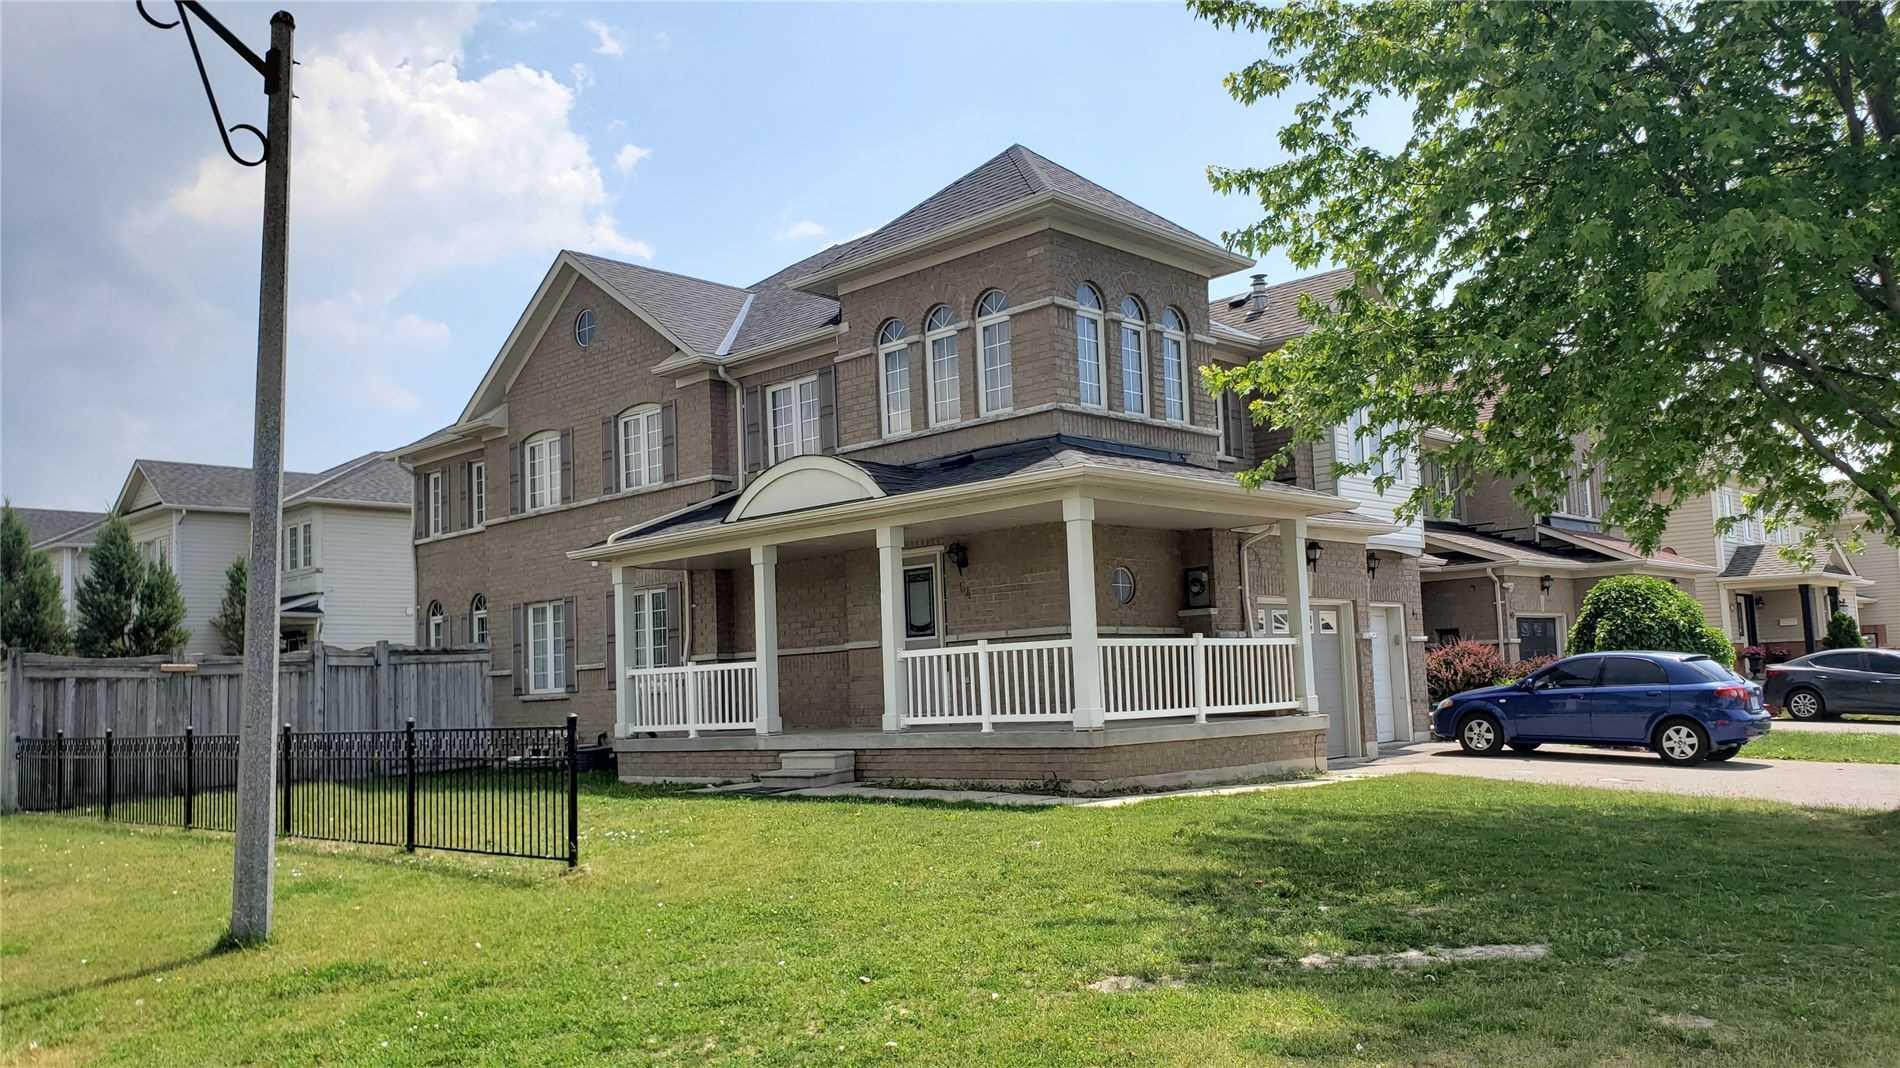 64 Robideau Pl, Whitby, Ontario L1R3G7, 4 Bedrooms Bedrooms, ,3 BathroomsBathrooms,Att/row/twnhouse,For Lease,Robideau,E5272334